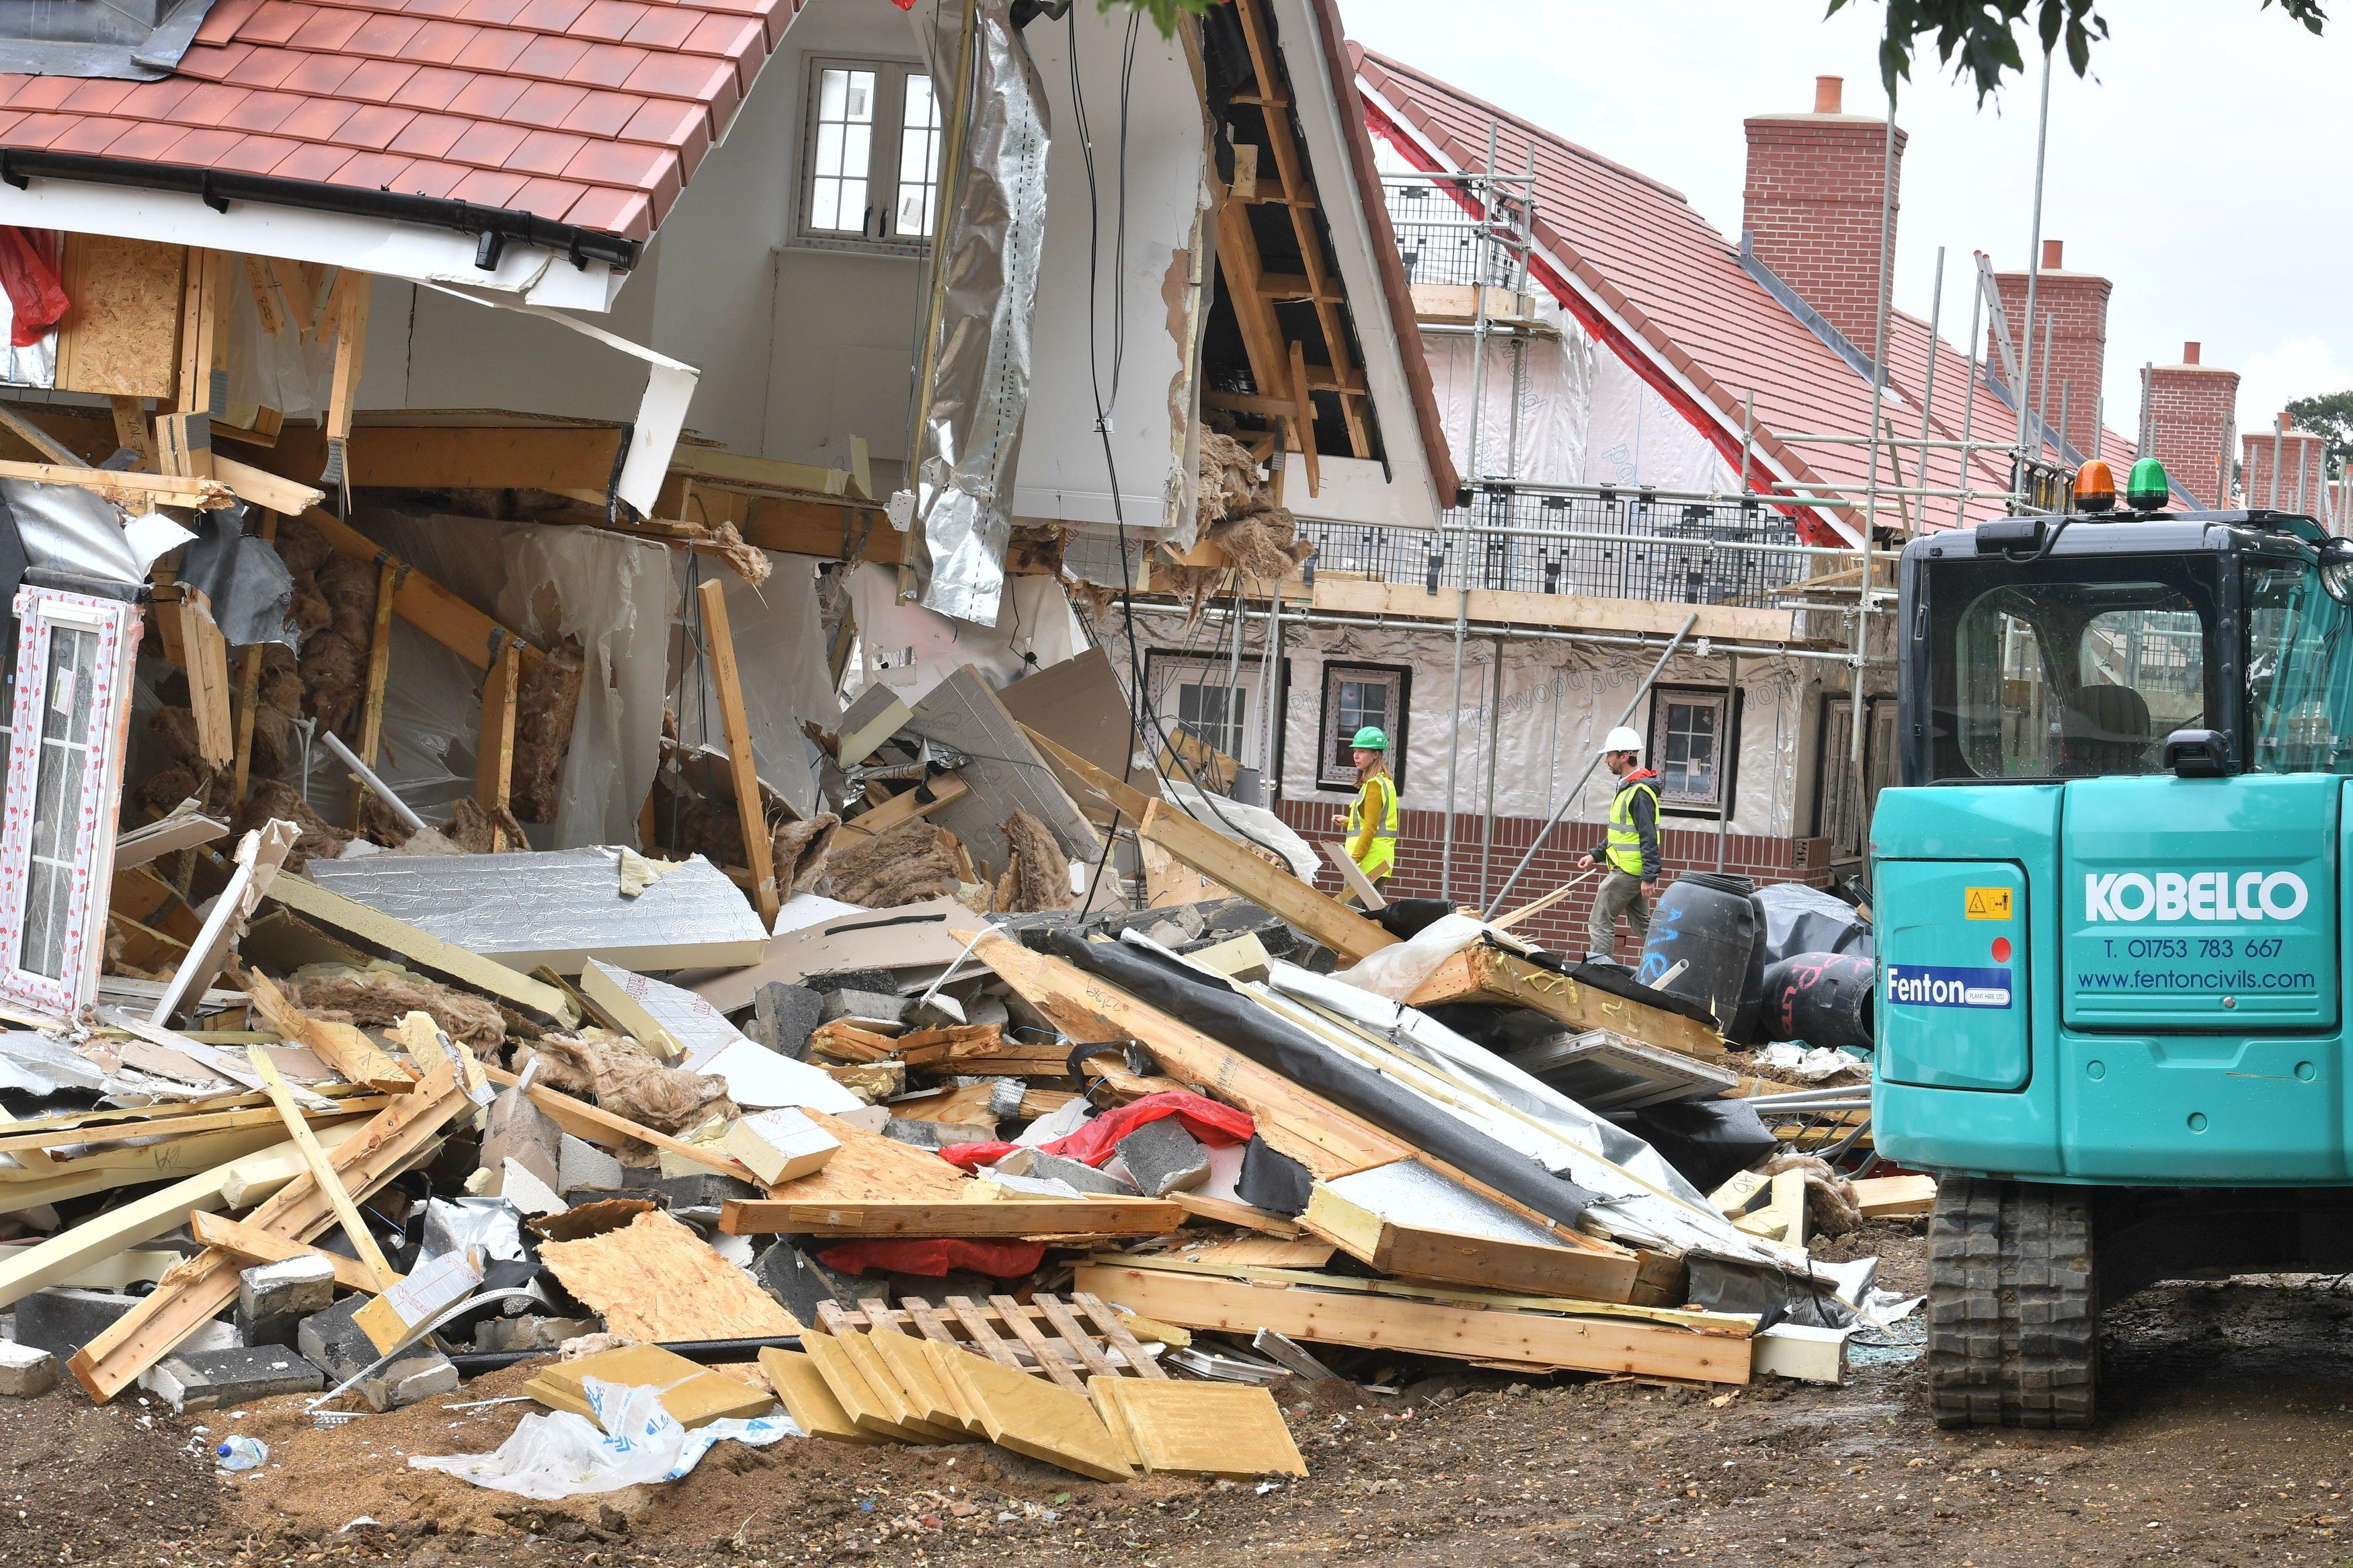 Daniel Neagu destrozó las viviendas que había construido